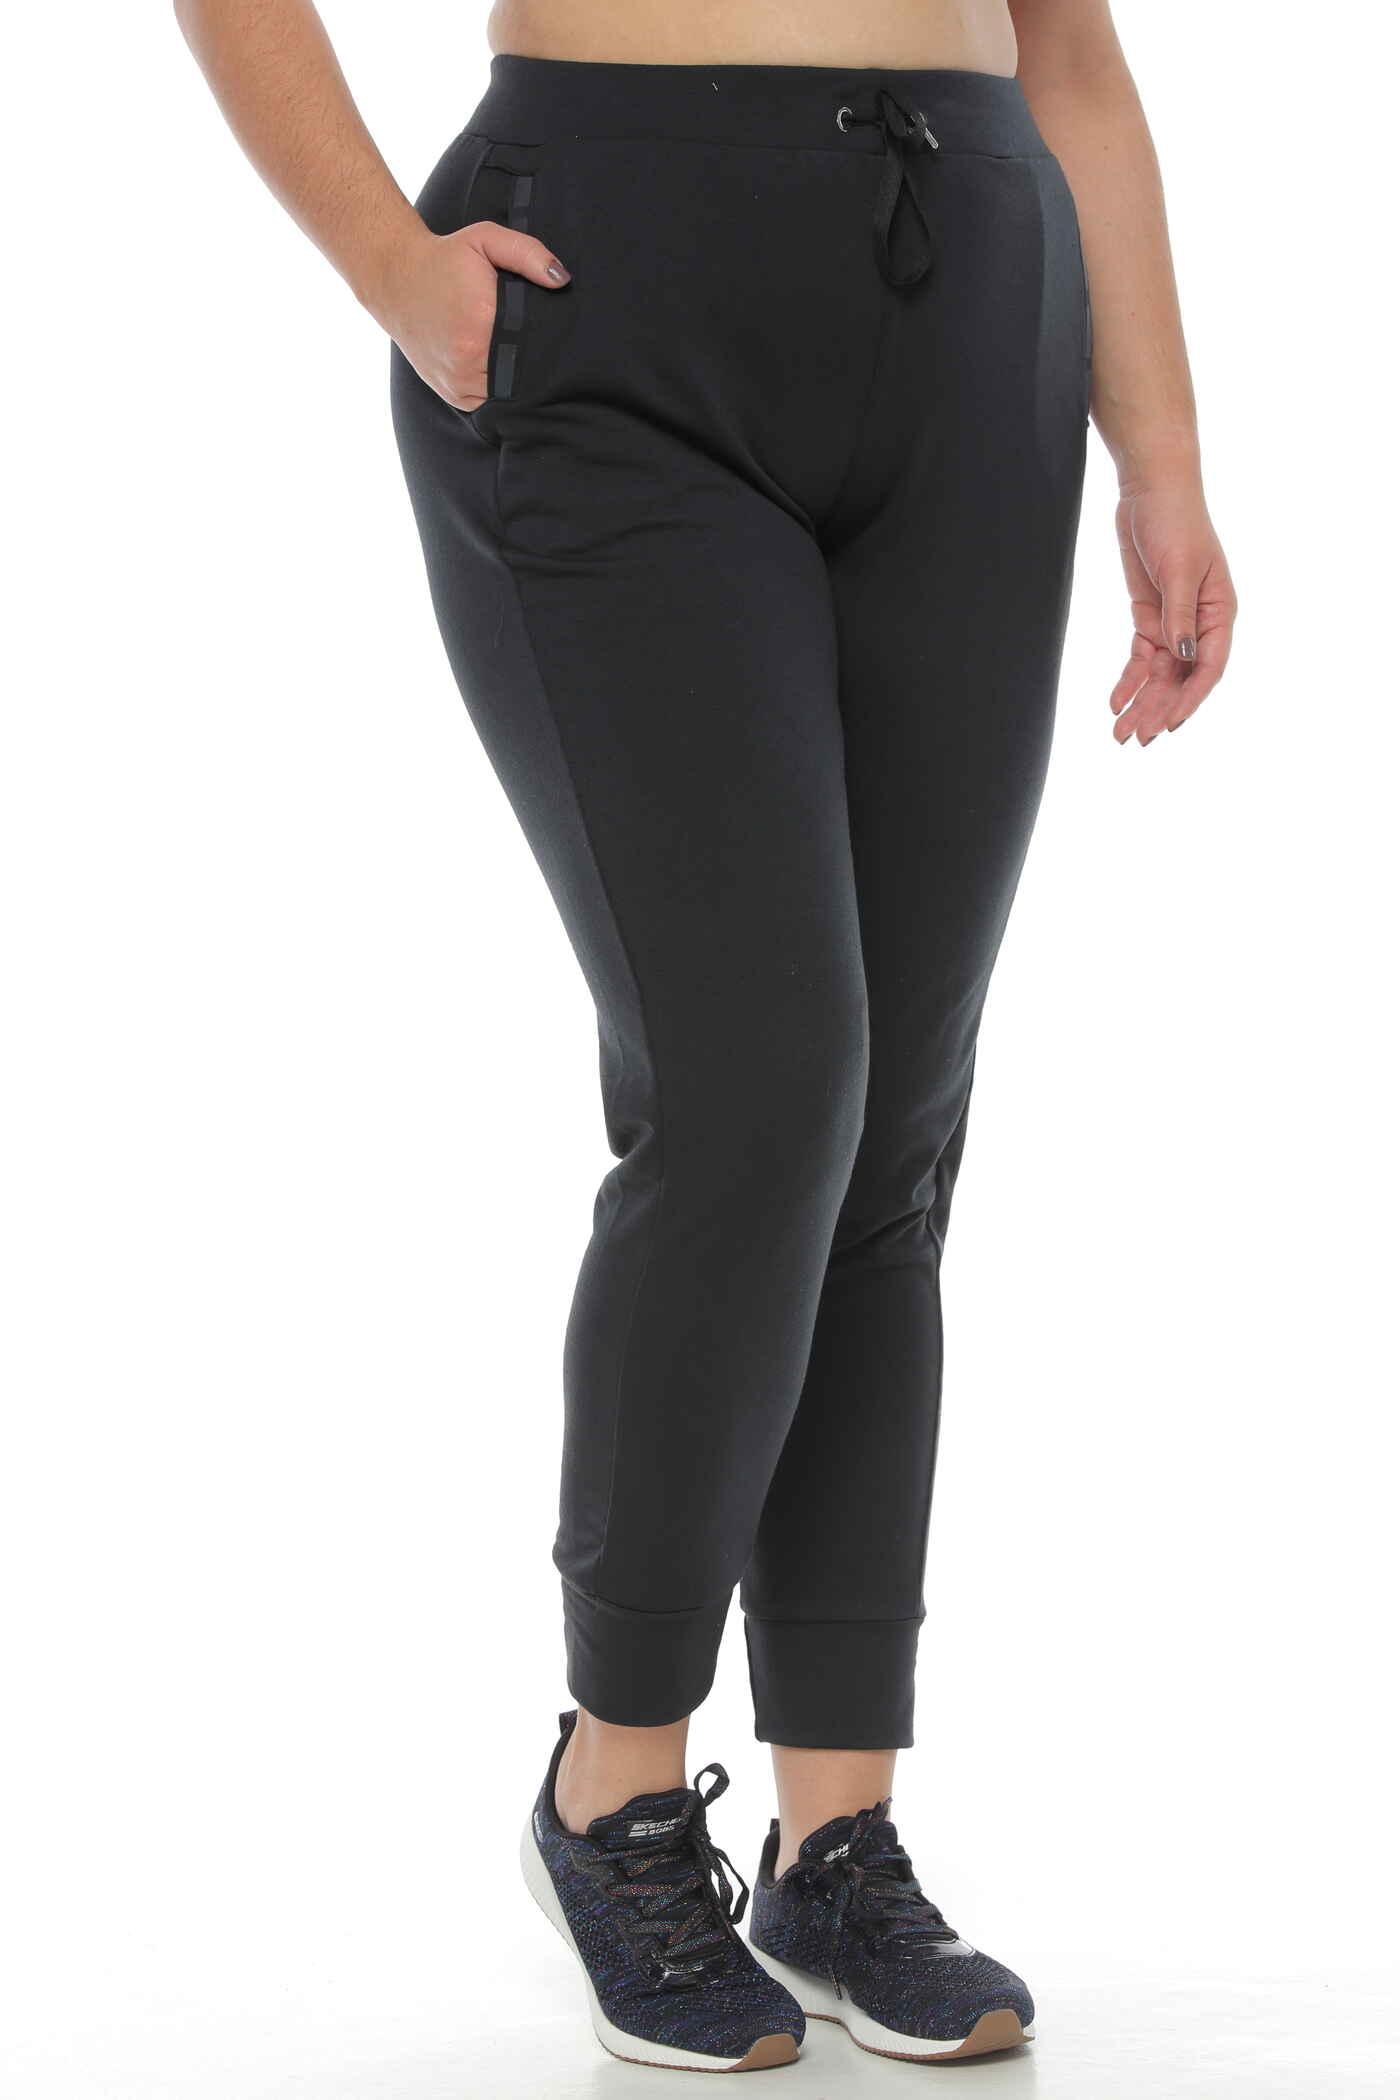 Pantalon Pluss Dama   240414